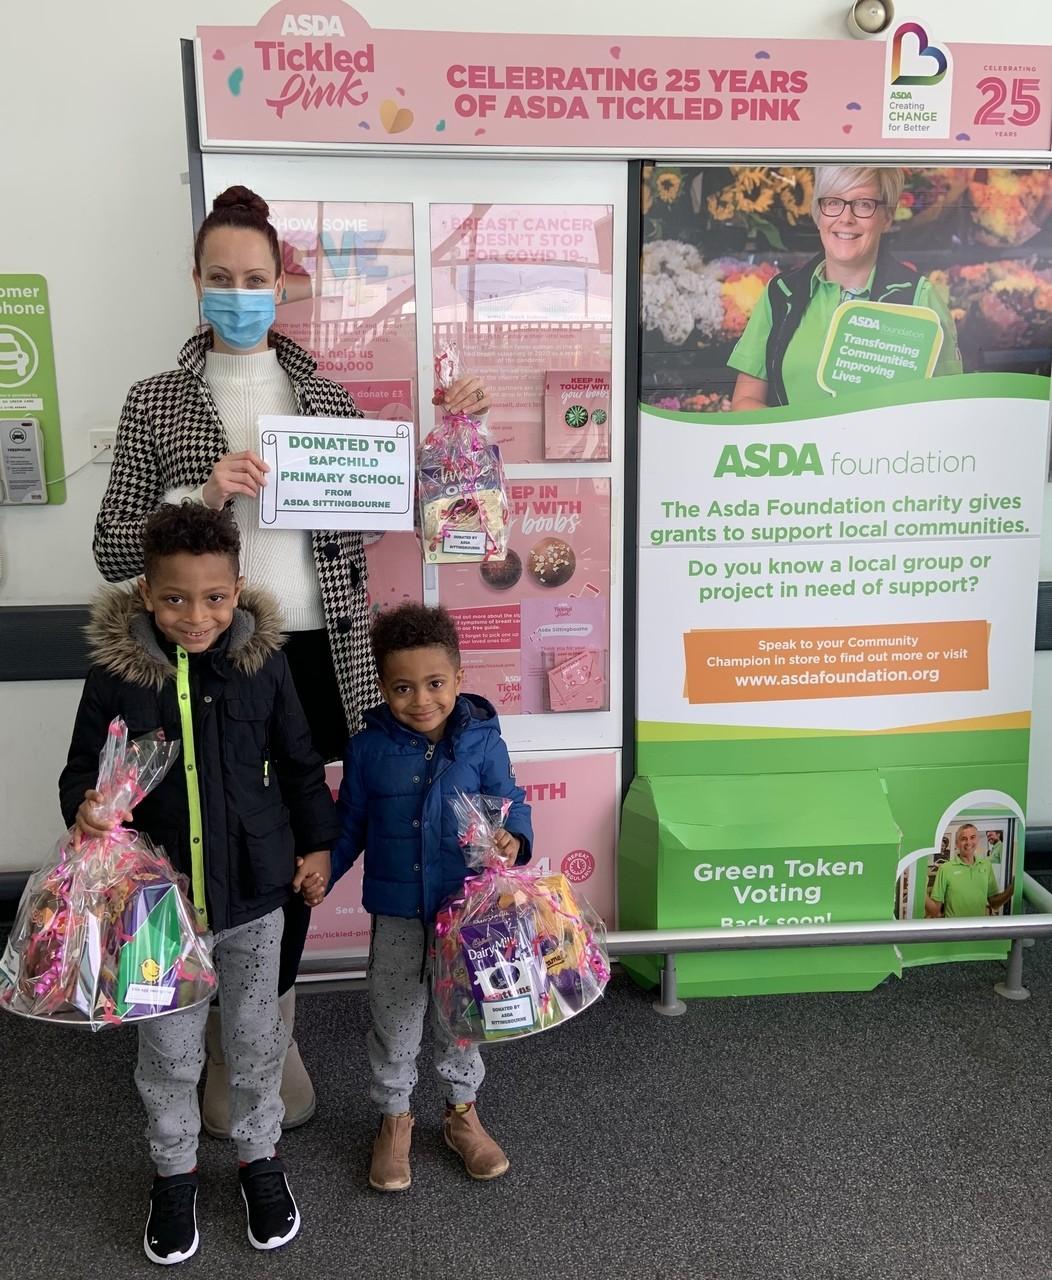 Easter Donation to Bapchild Primary School   Asda Sittingbourne